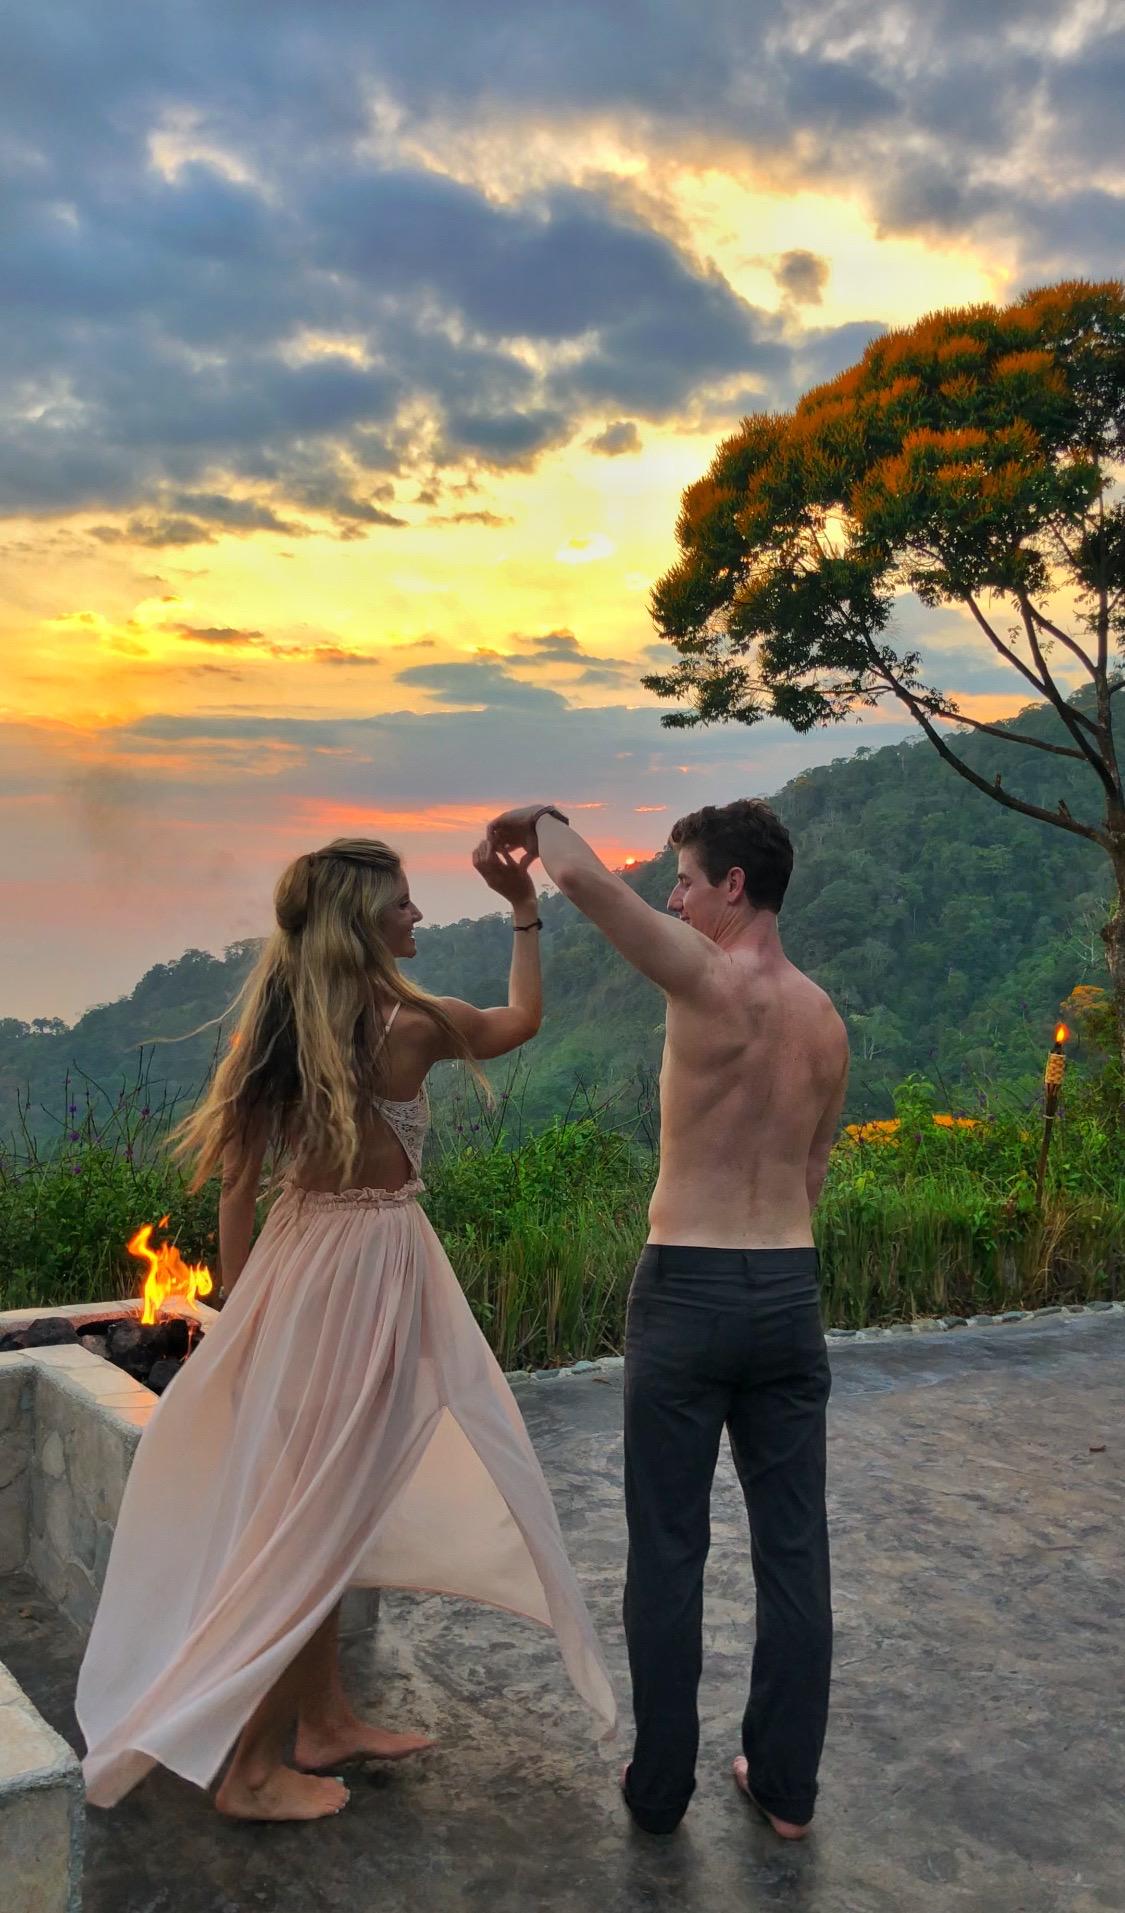 Dancig Costa Rica: Vista Celestial